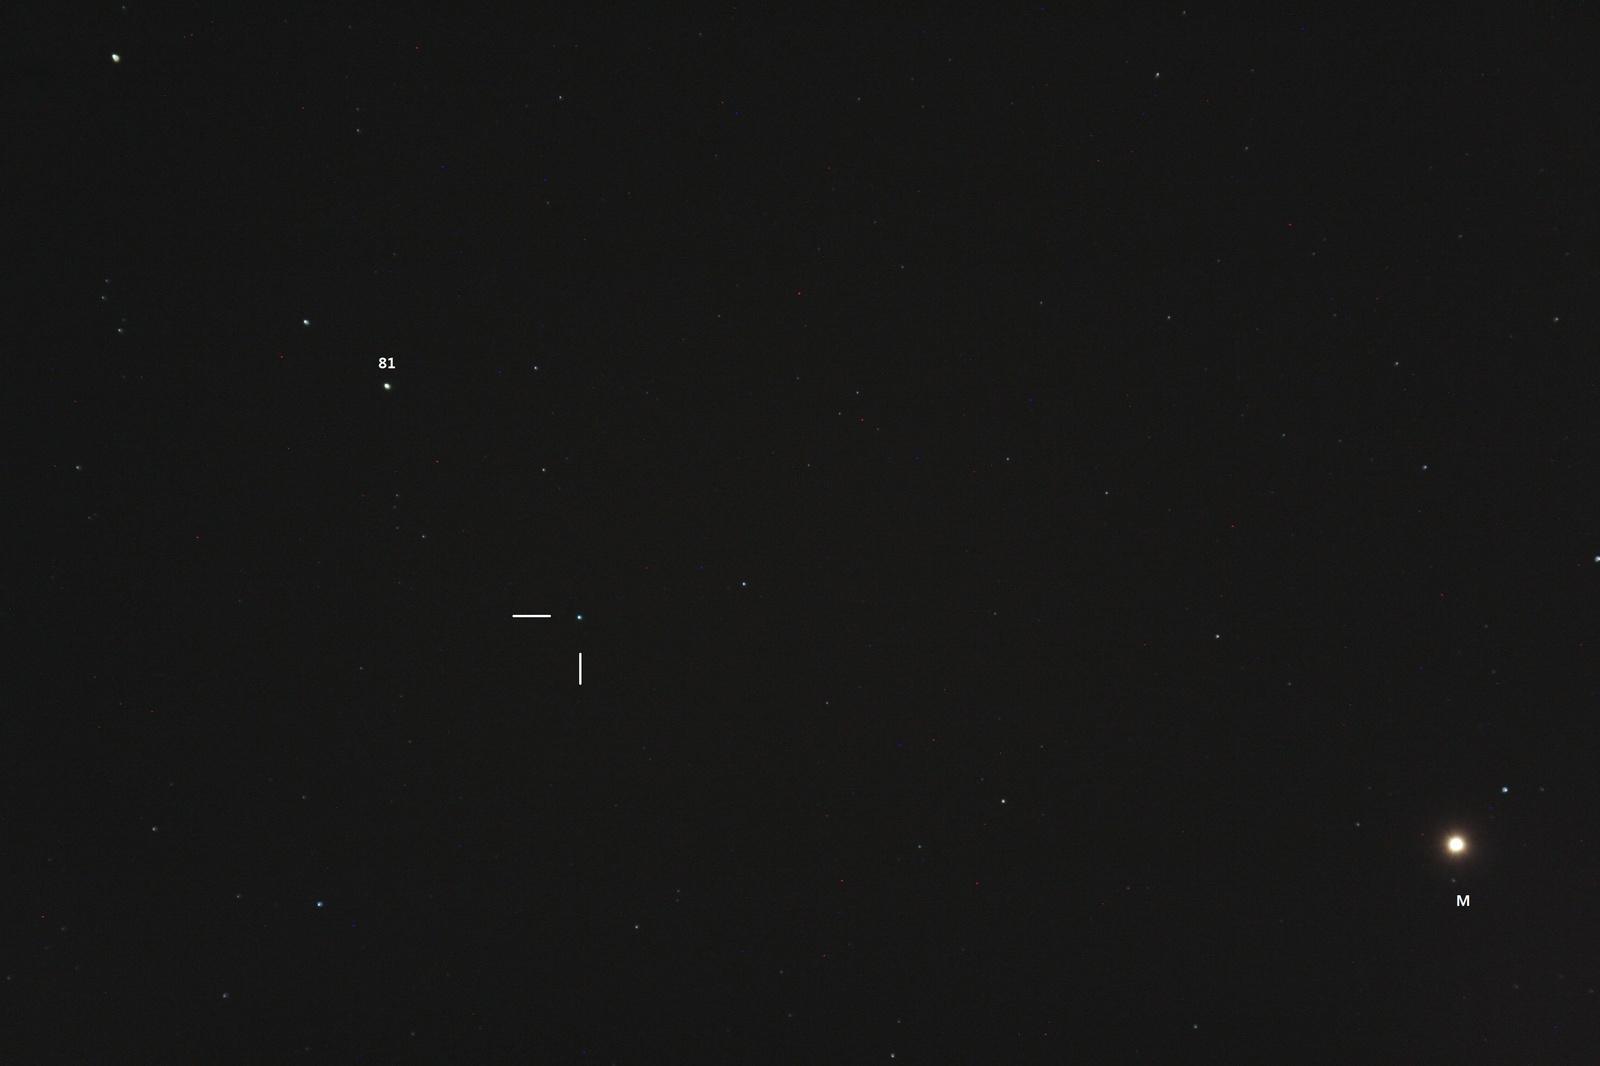 neptun-mars..thumb.jpg.f1a68d79c1c7139d21fcc1f74c2ee5c8.jpg